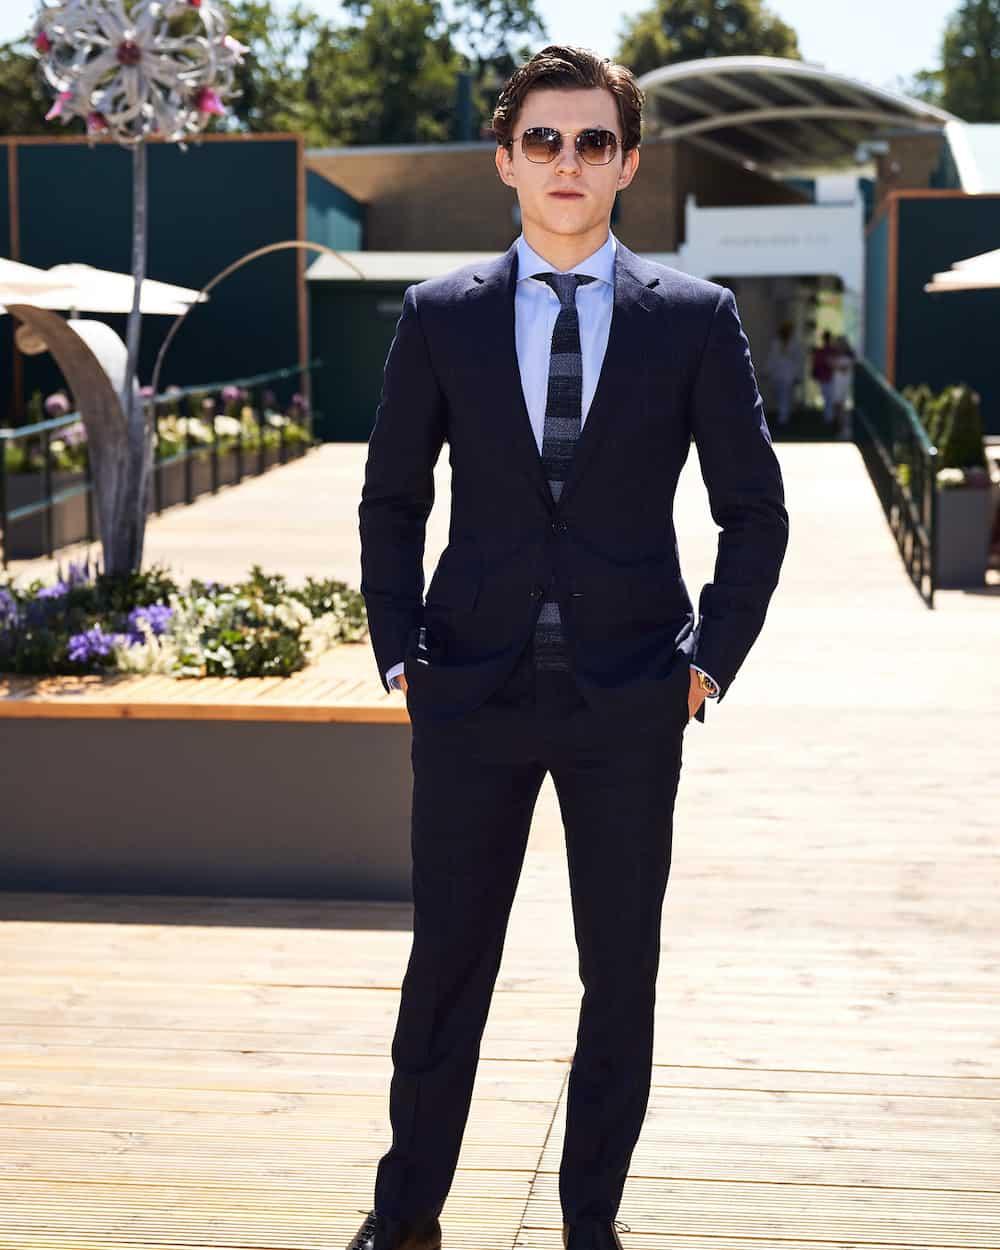 Tom holland height